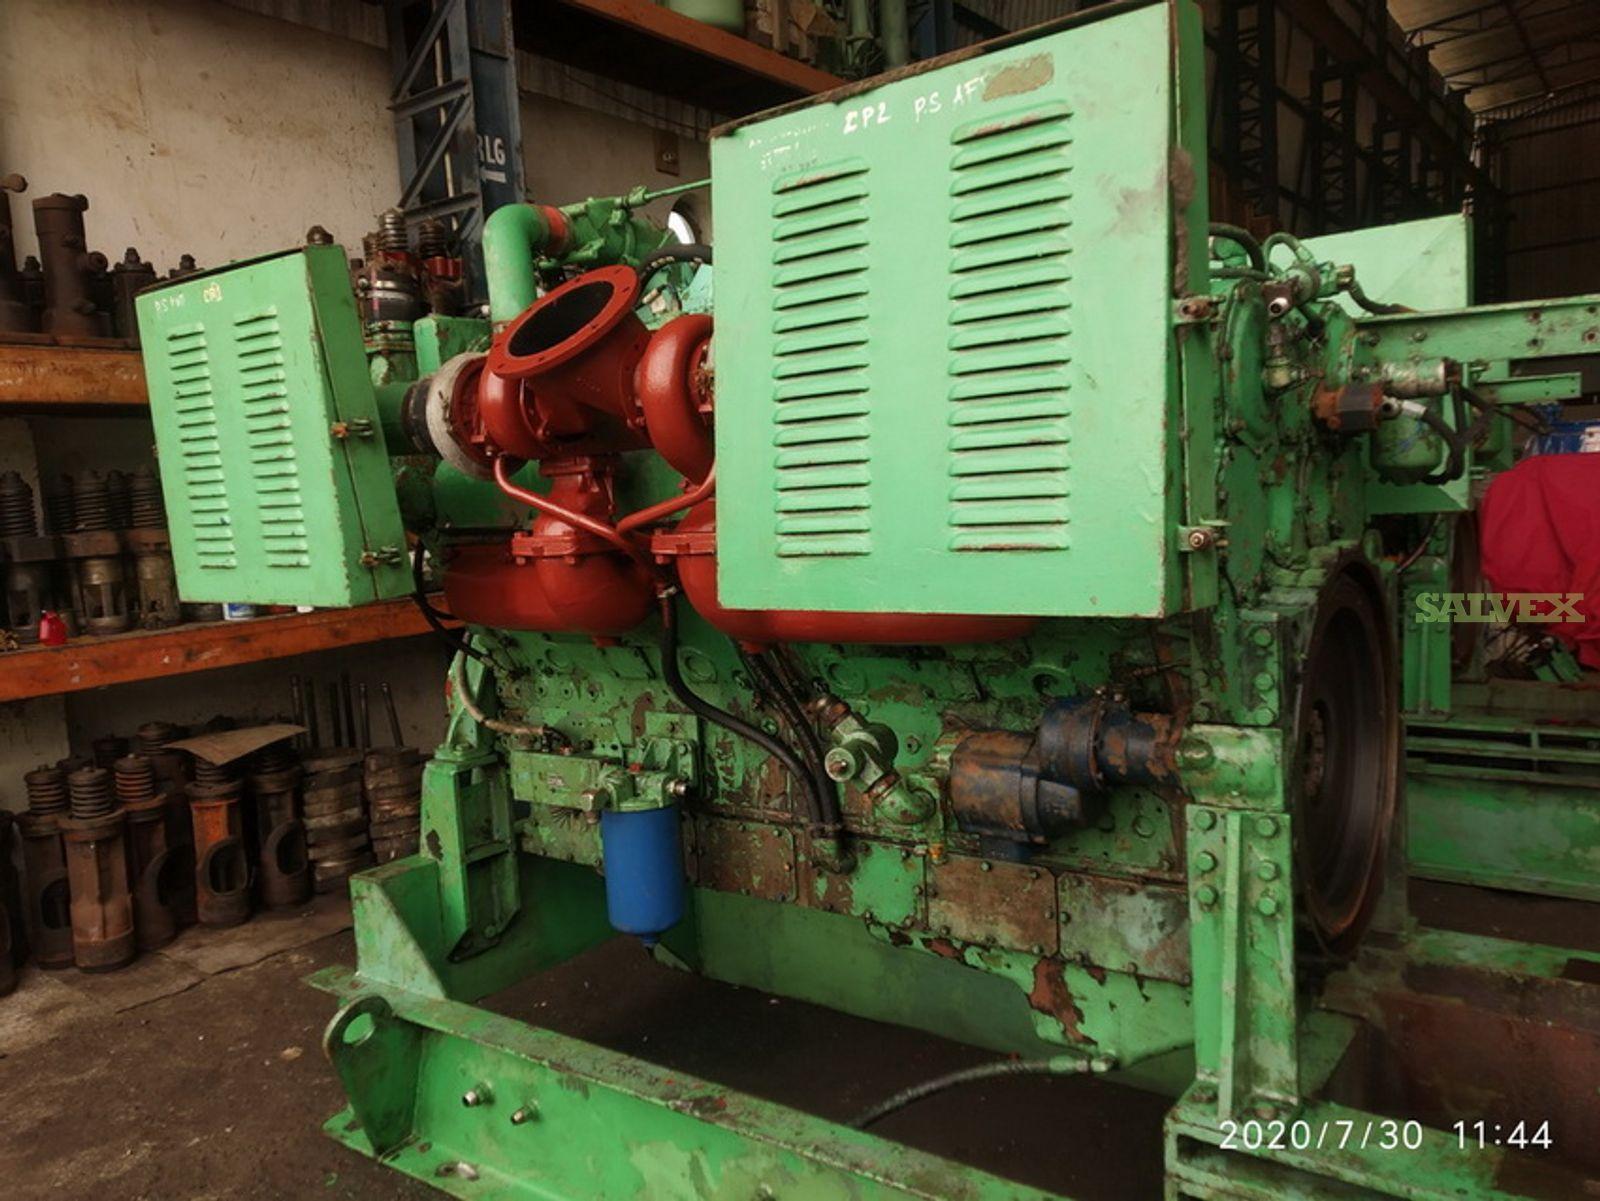 Detroit Diesel Marine Engines Type 12V149 (2 Units)